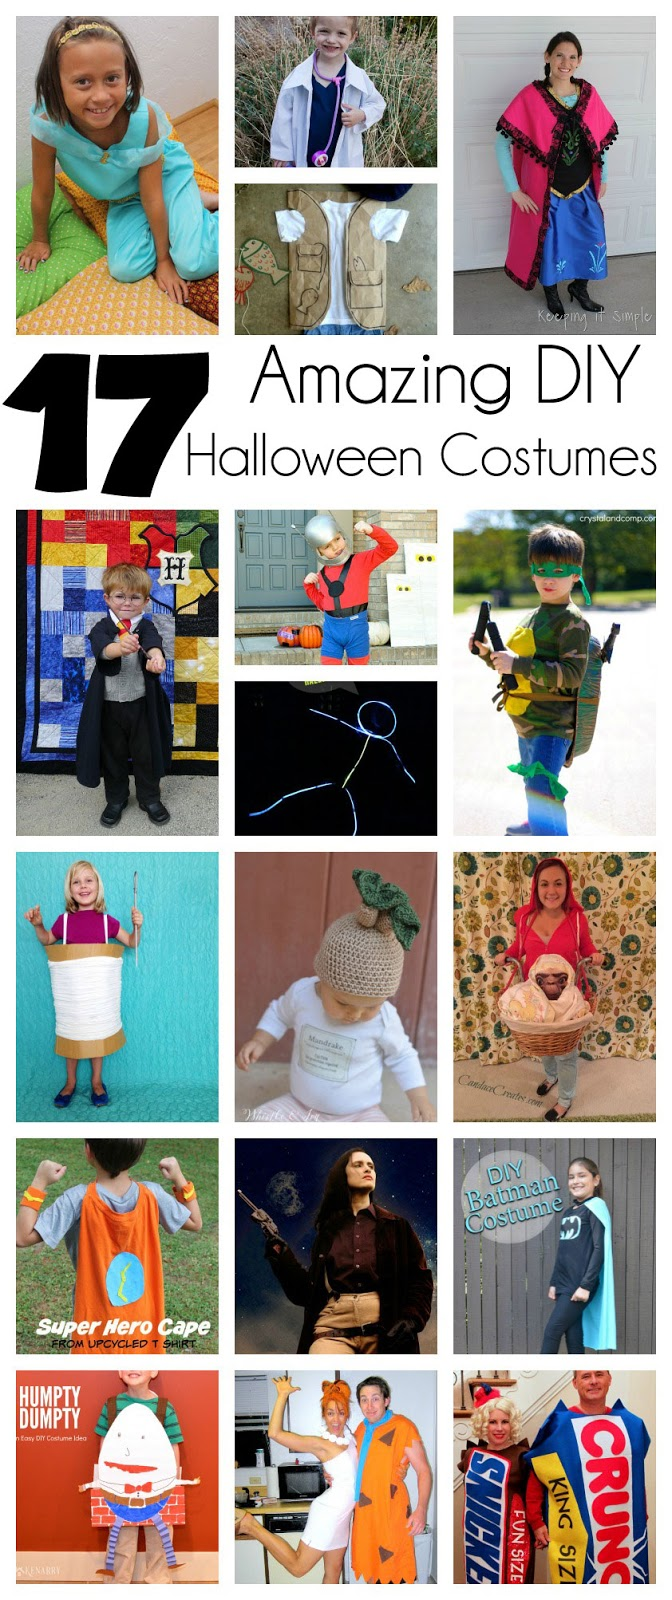 Fabulous DIY costume tutorials